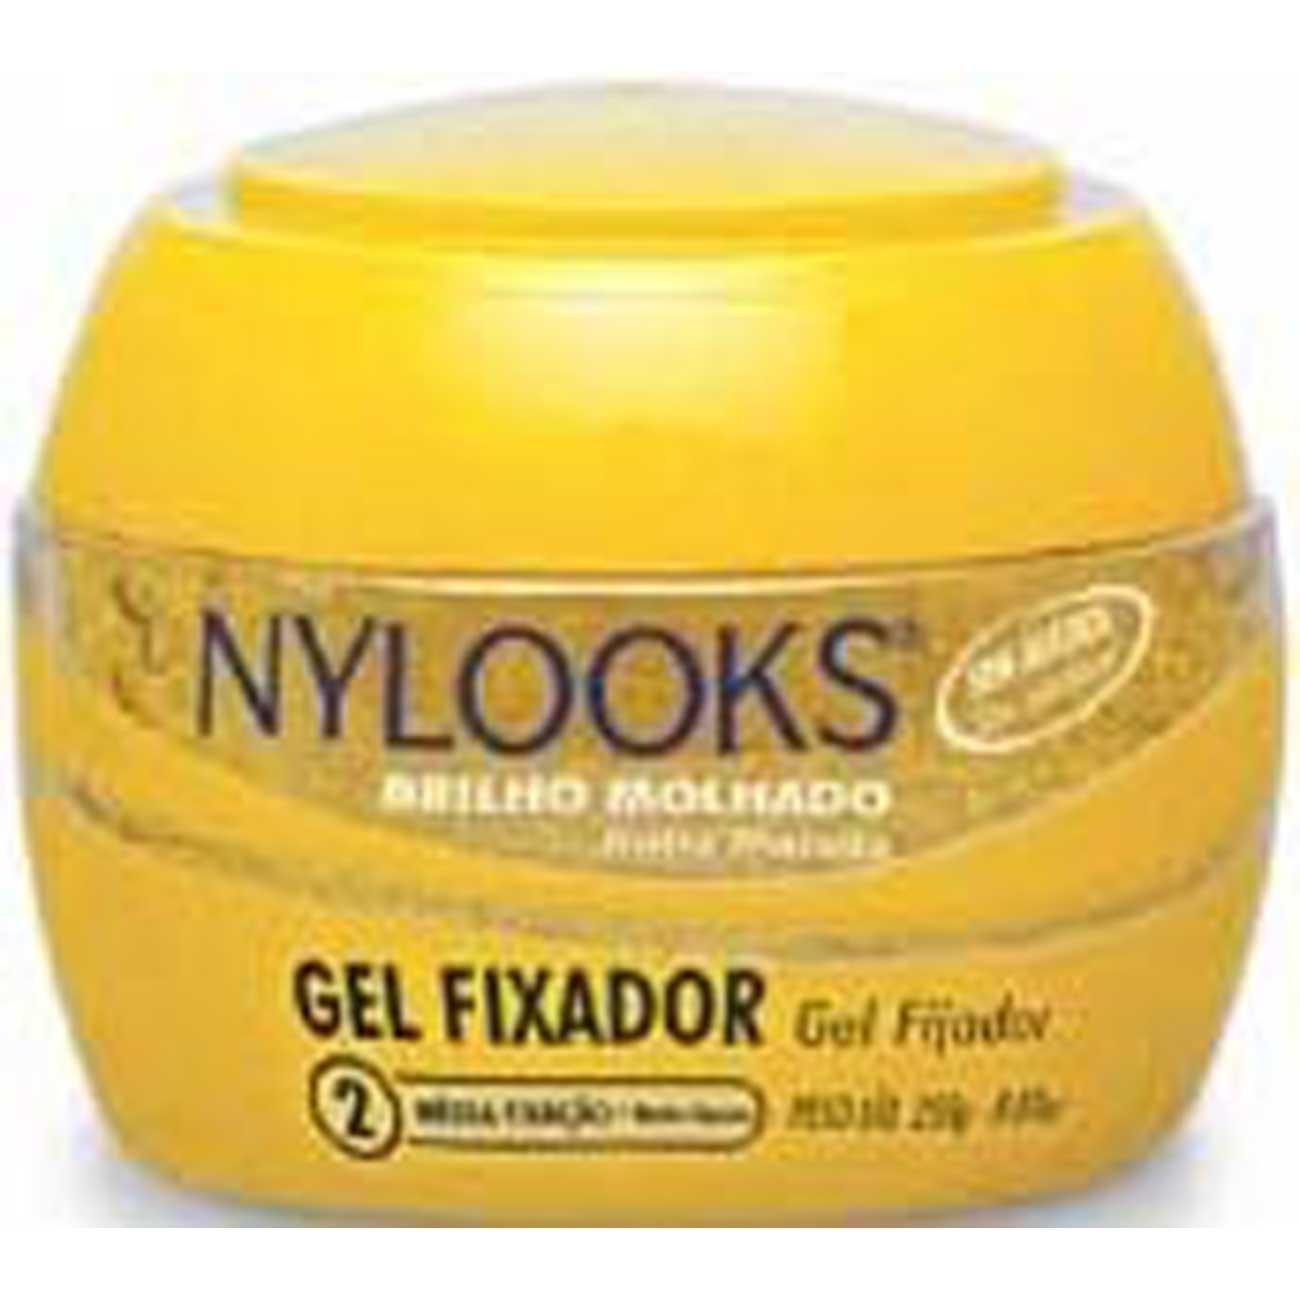 Gel Fixador Nylooks 250G Media Amarelo 2